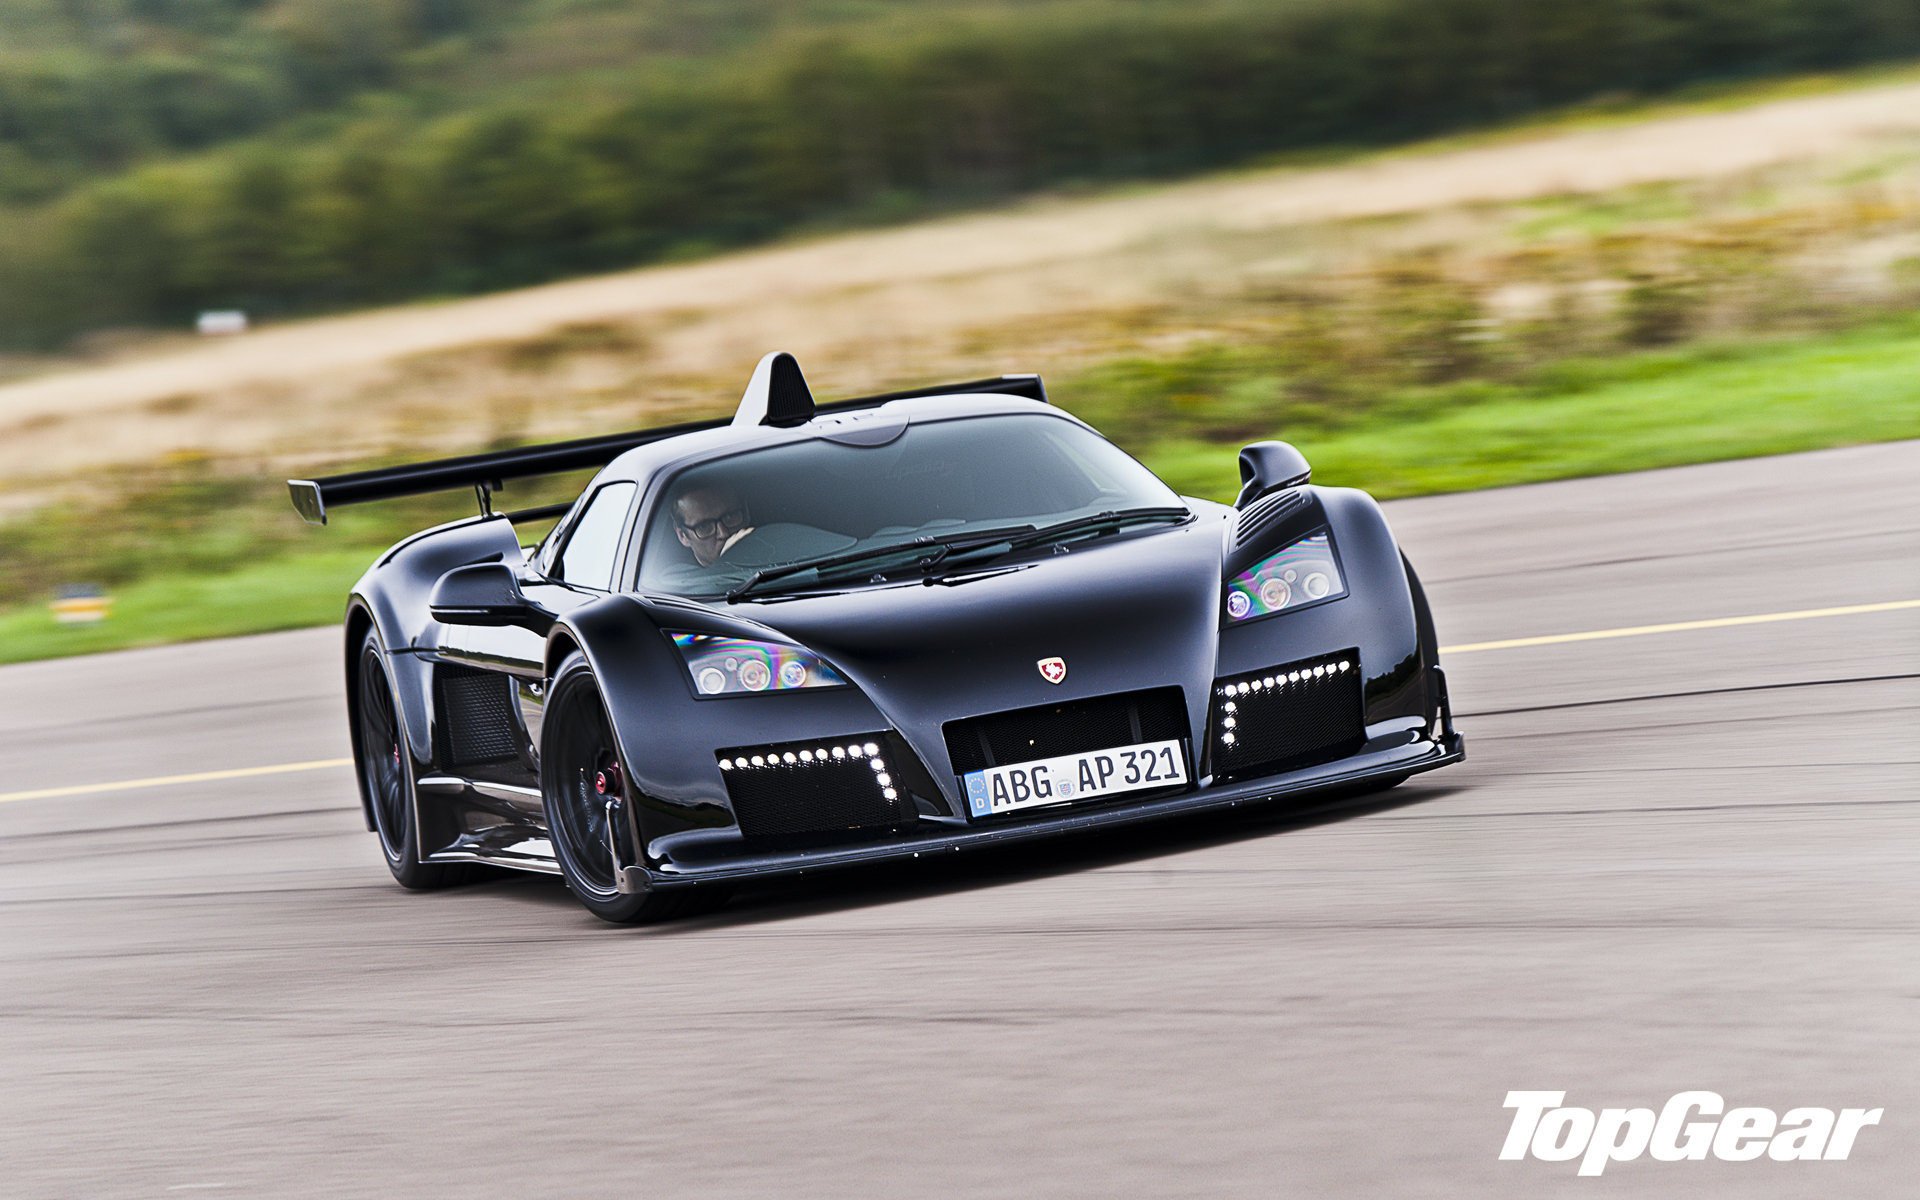 Gumpert Car News - BBC Top Gear Australia